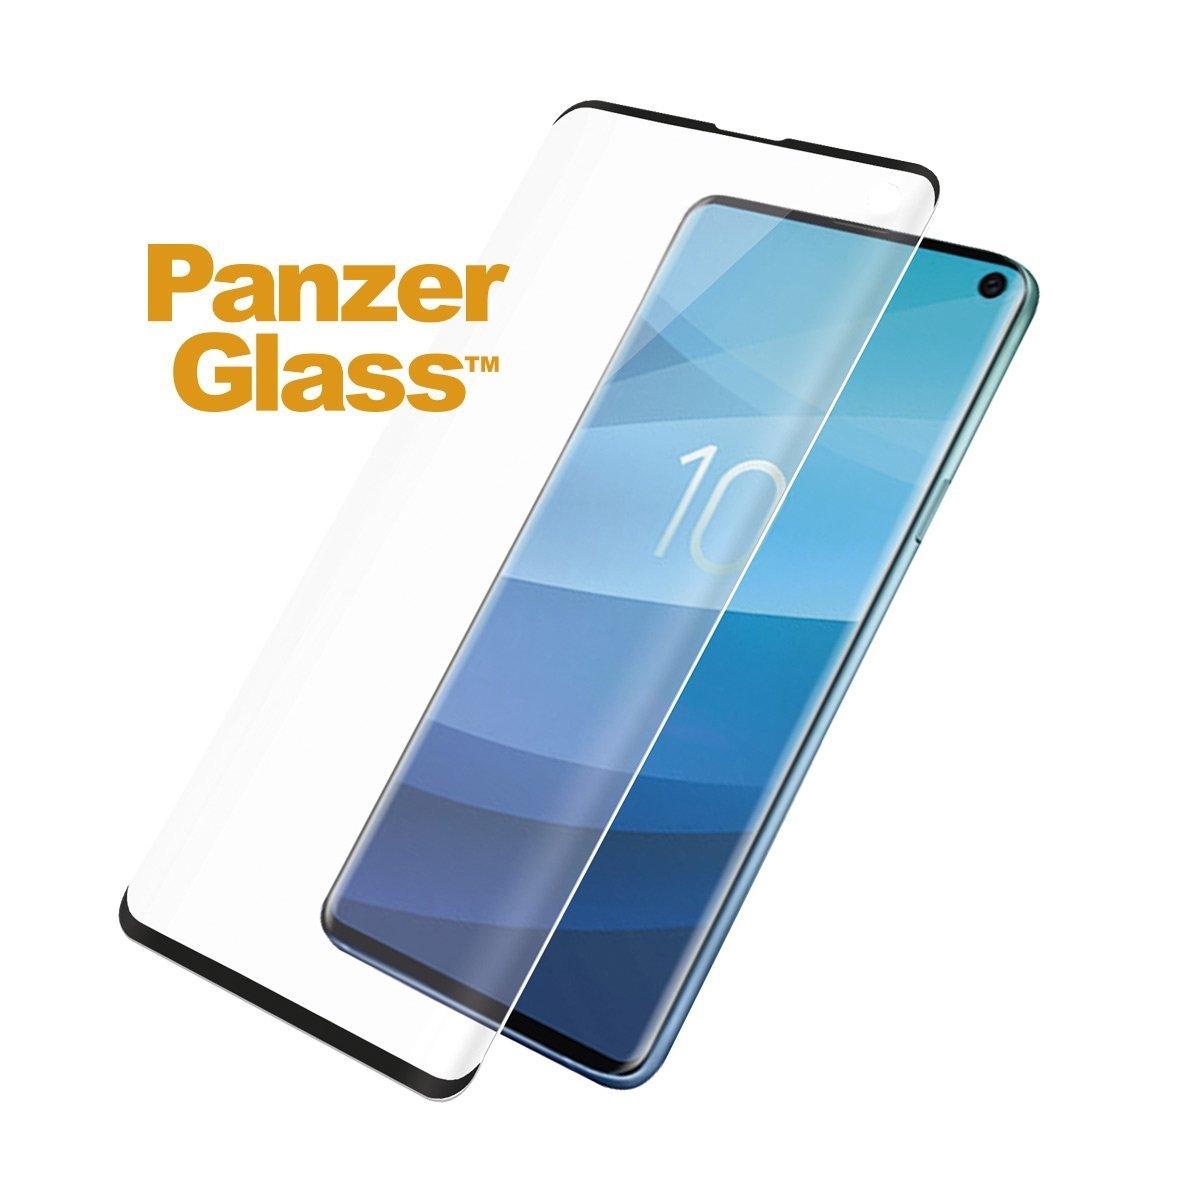 PanzerGlass Tempered Glass - Fullface Αντιχαρακτικό Γυαλί Οθόνης Samsung Galaxy S10 - Black (1123100005386)